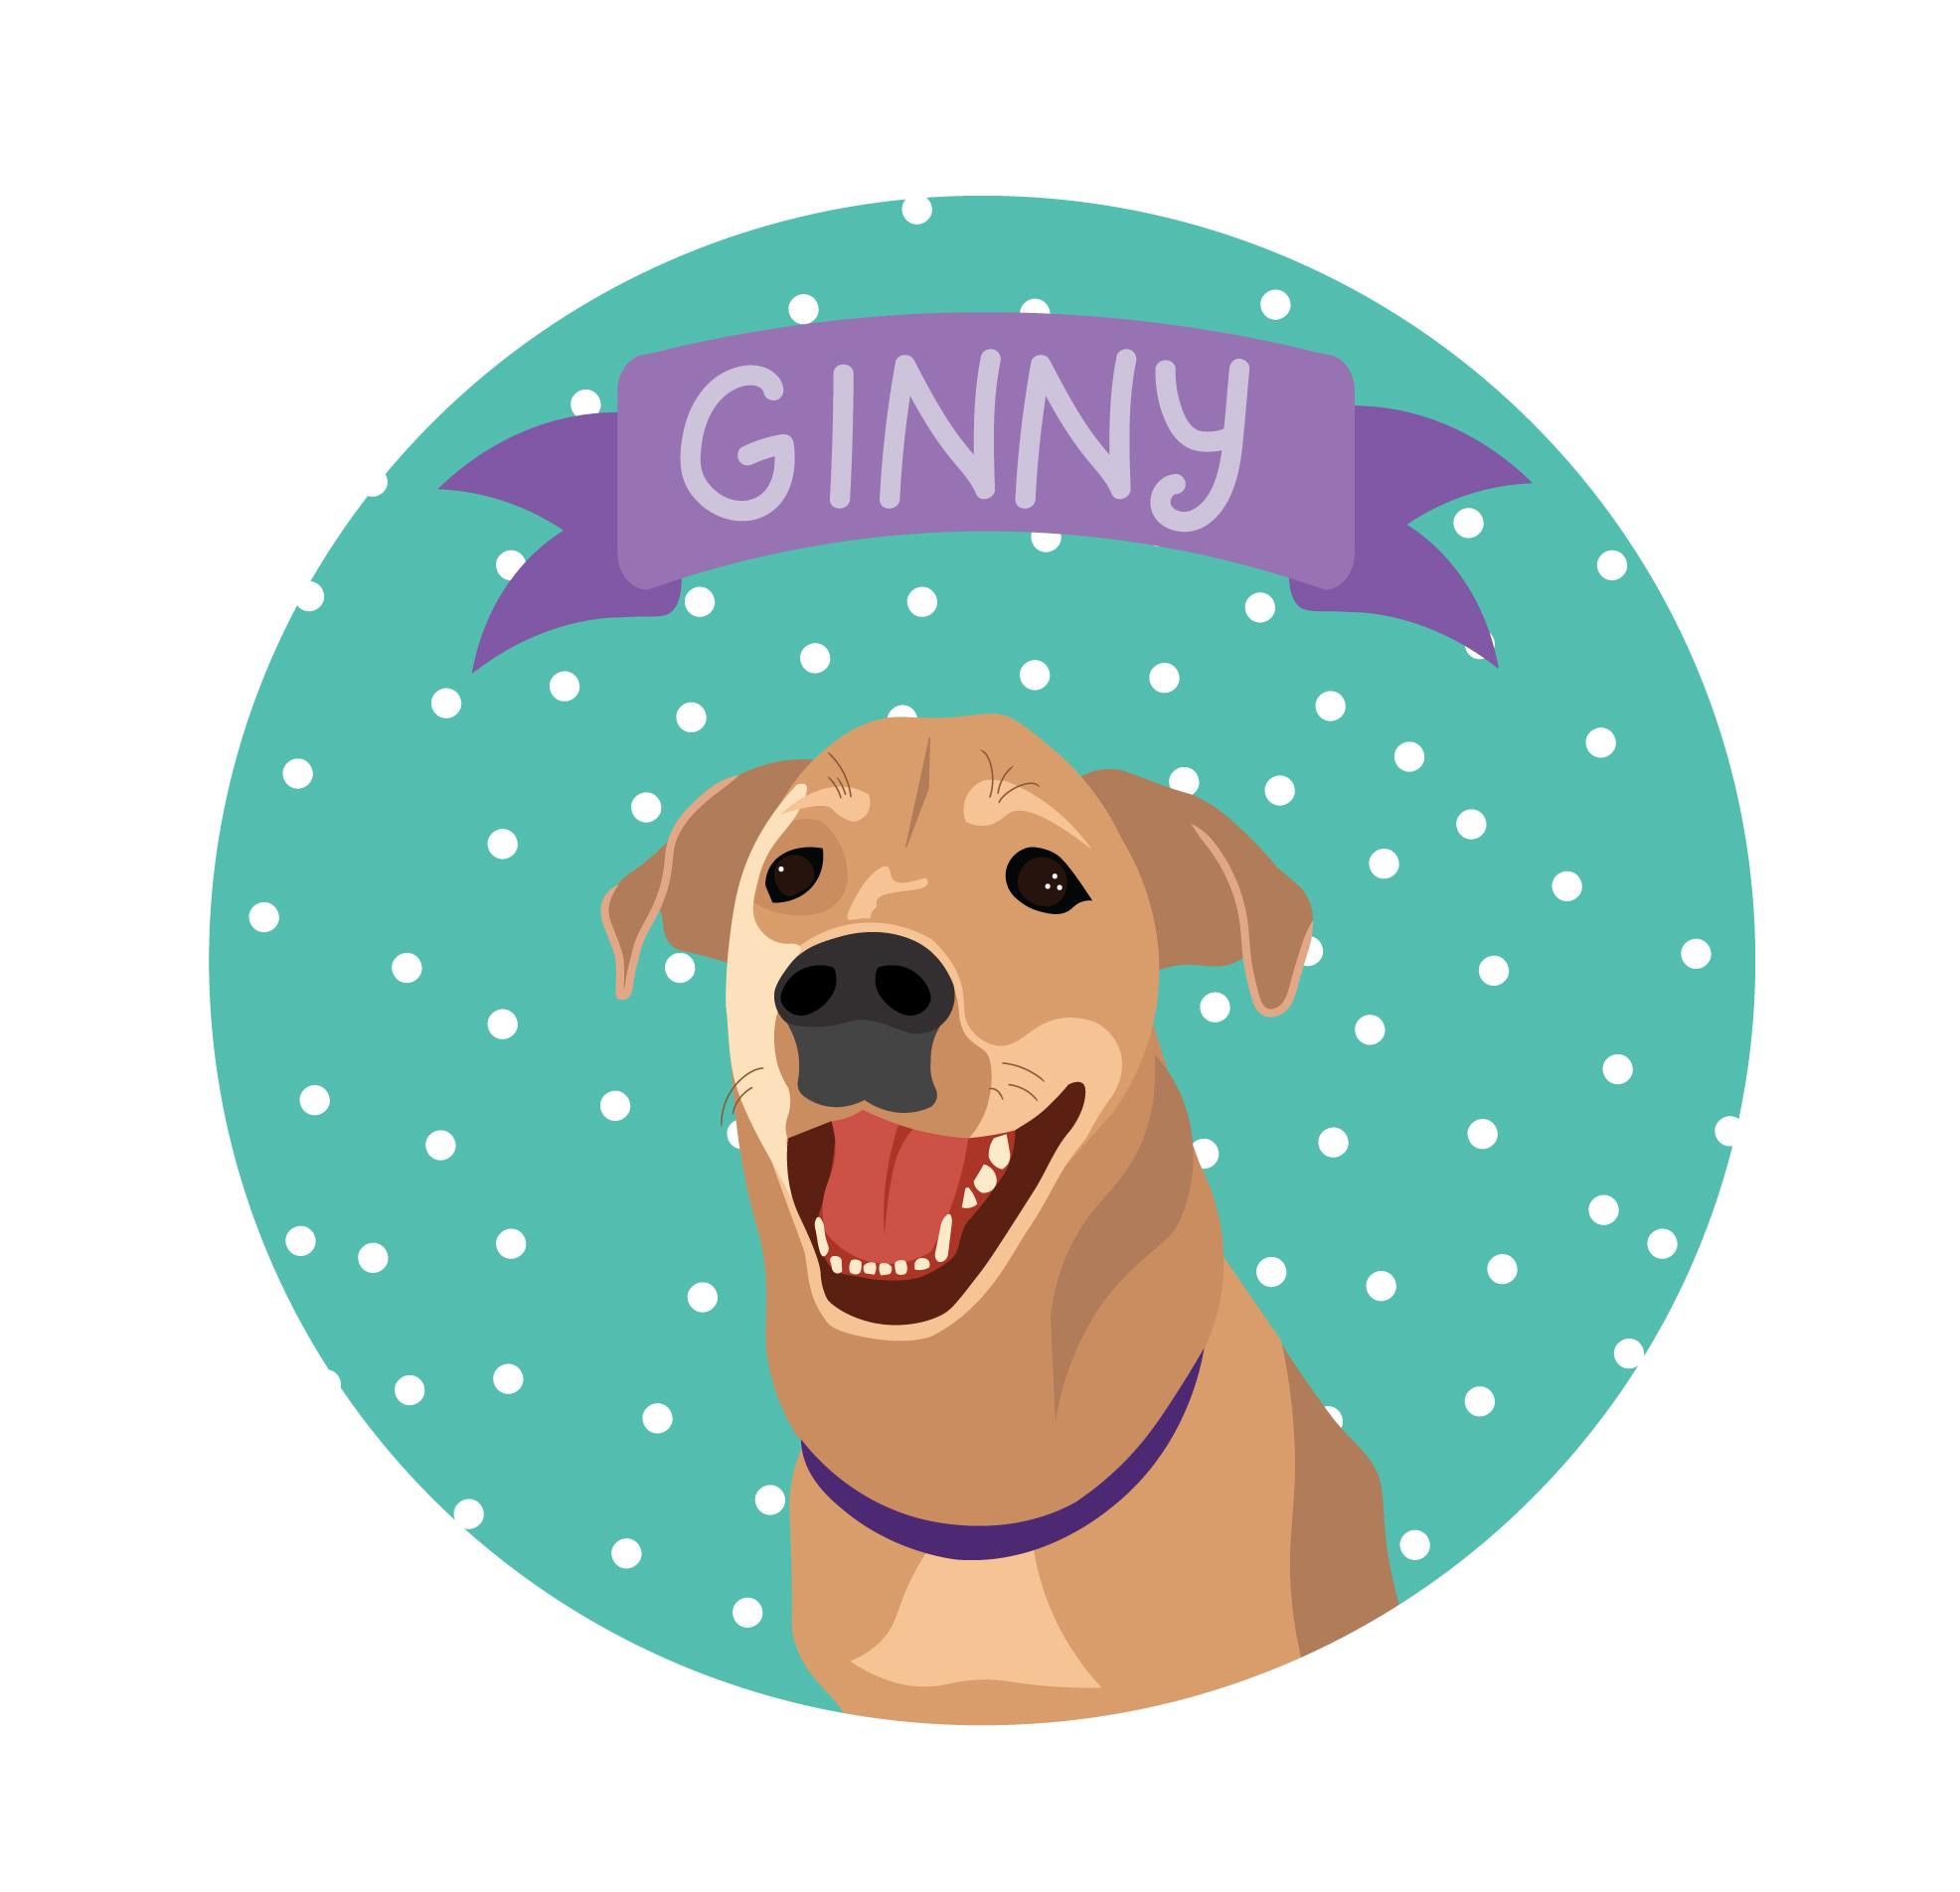 ginnyv8.jpg